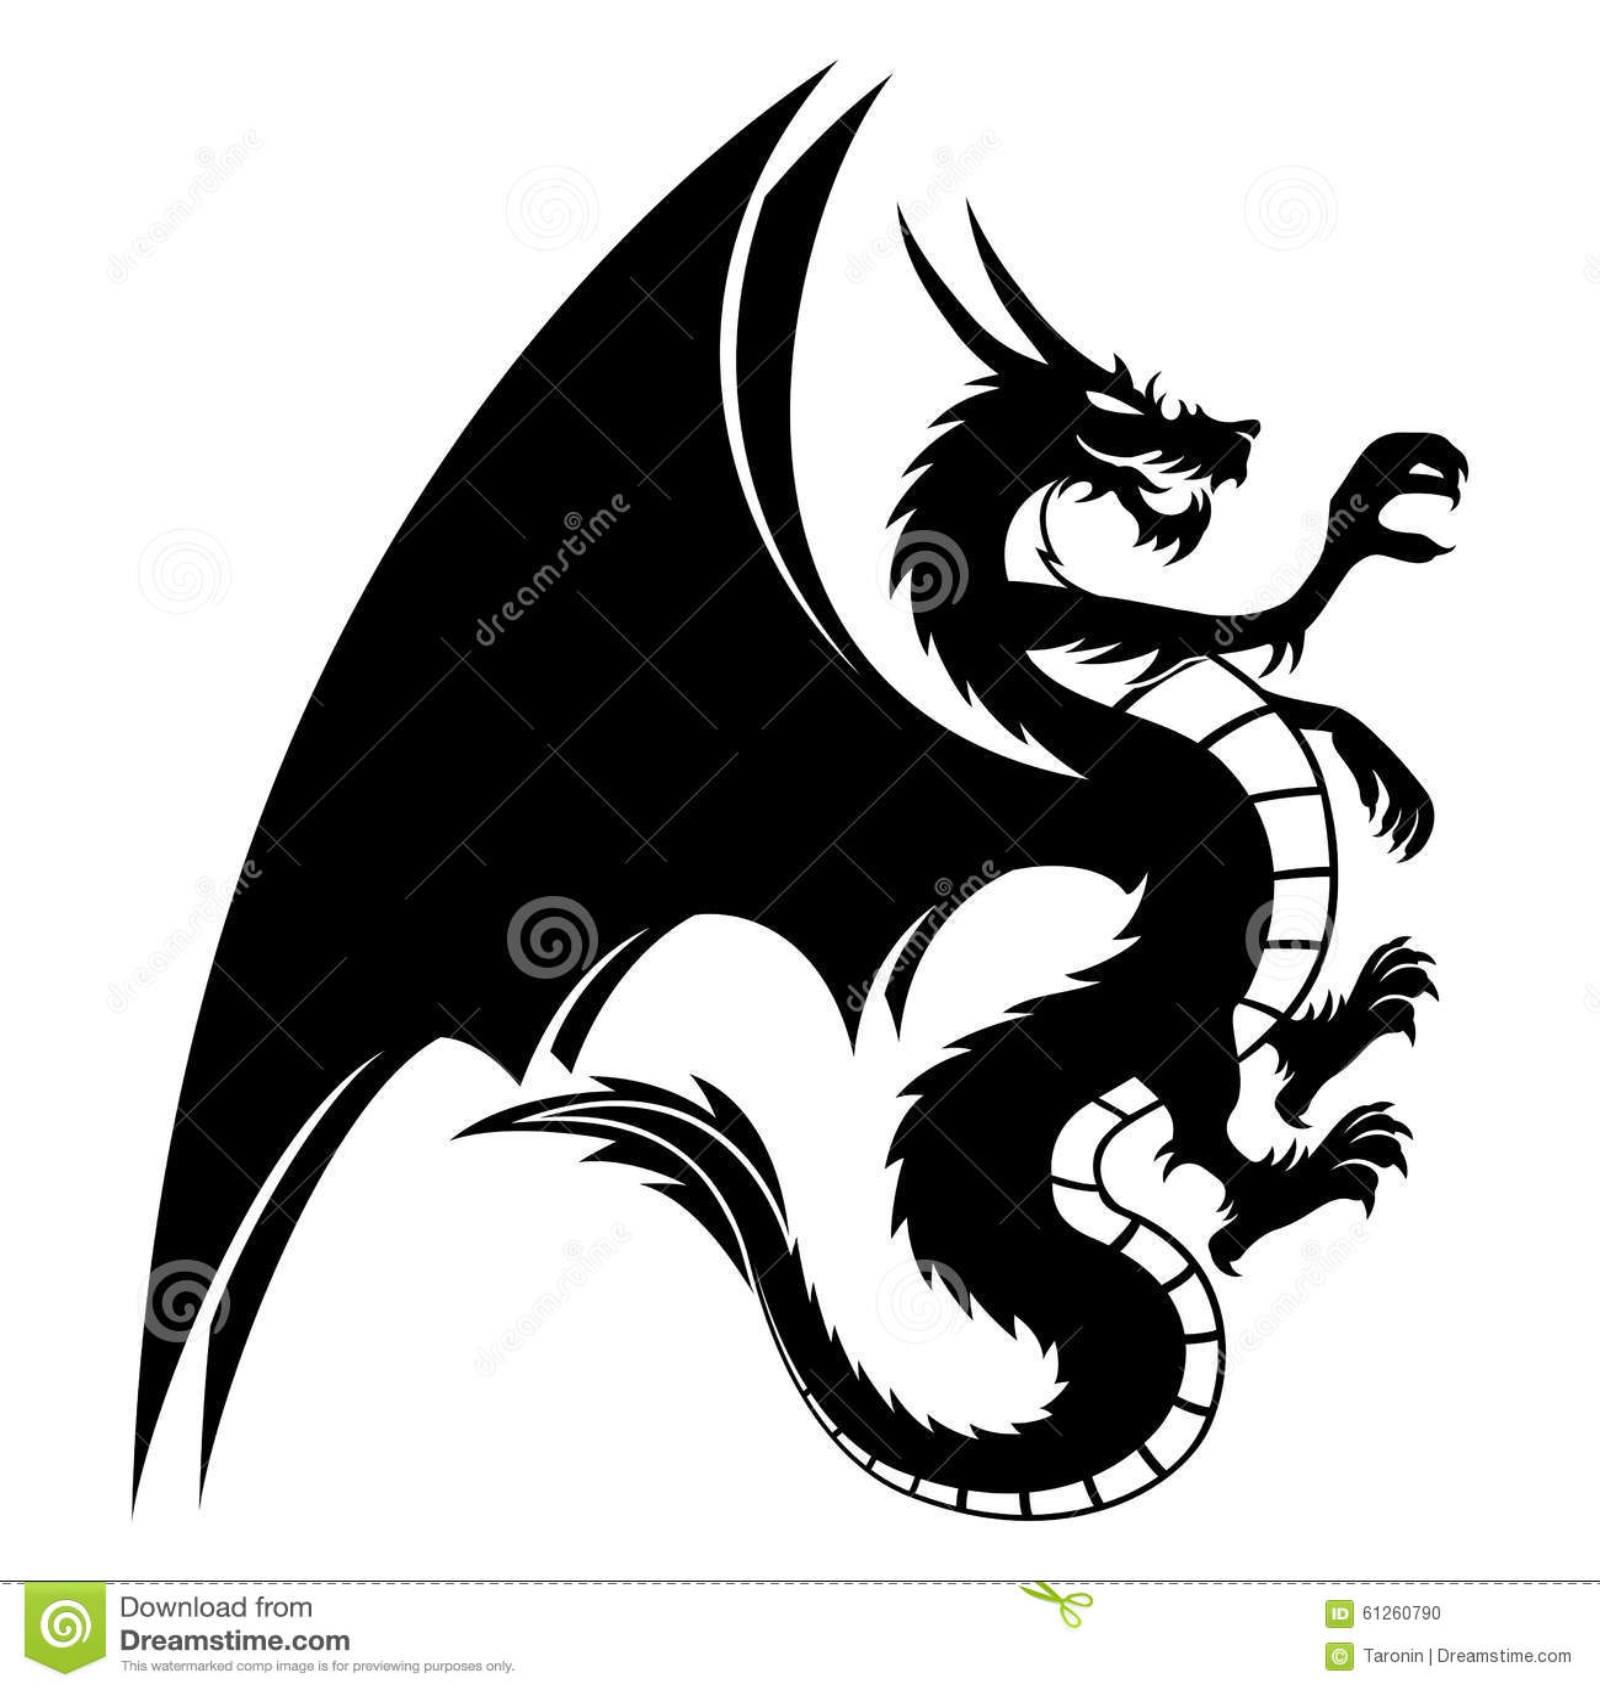 Black Dragon On White. Stock Vector - Image: 61260790